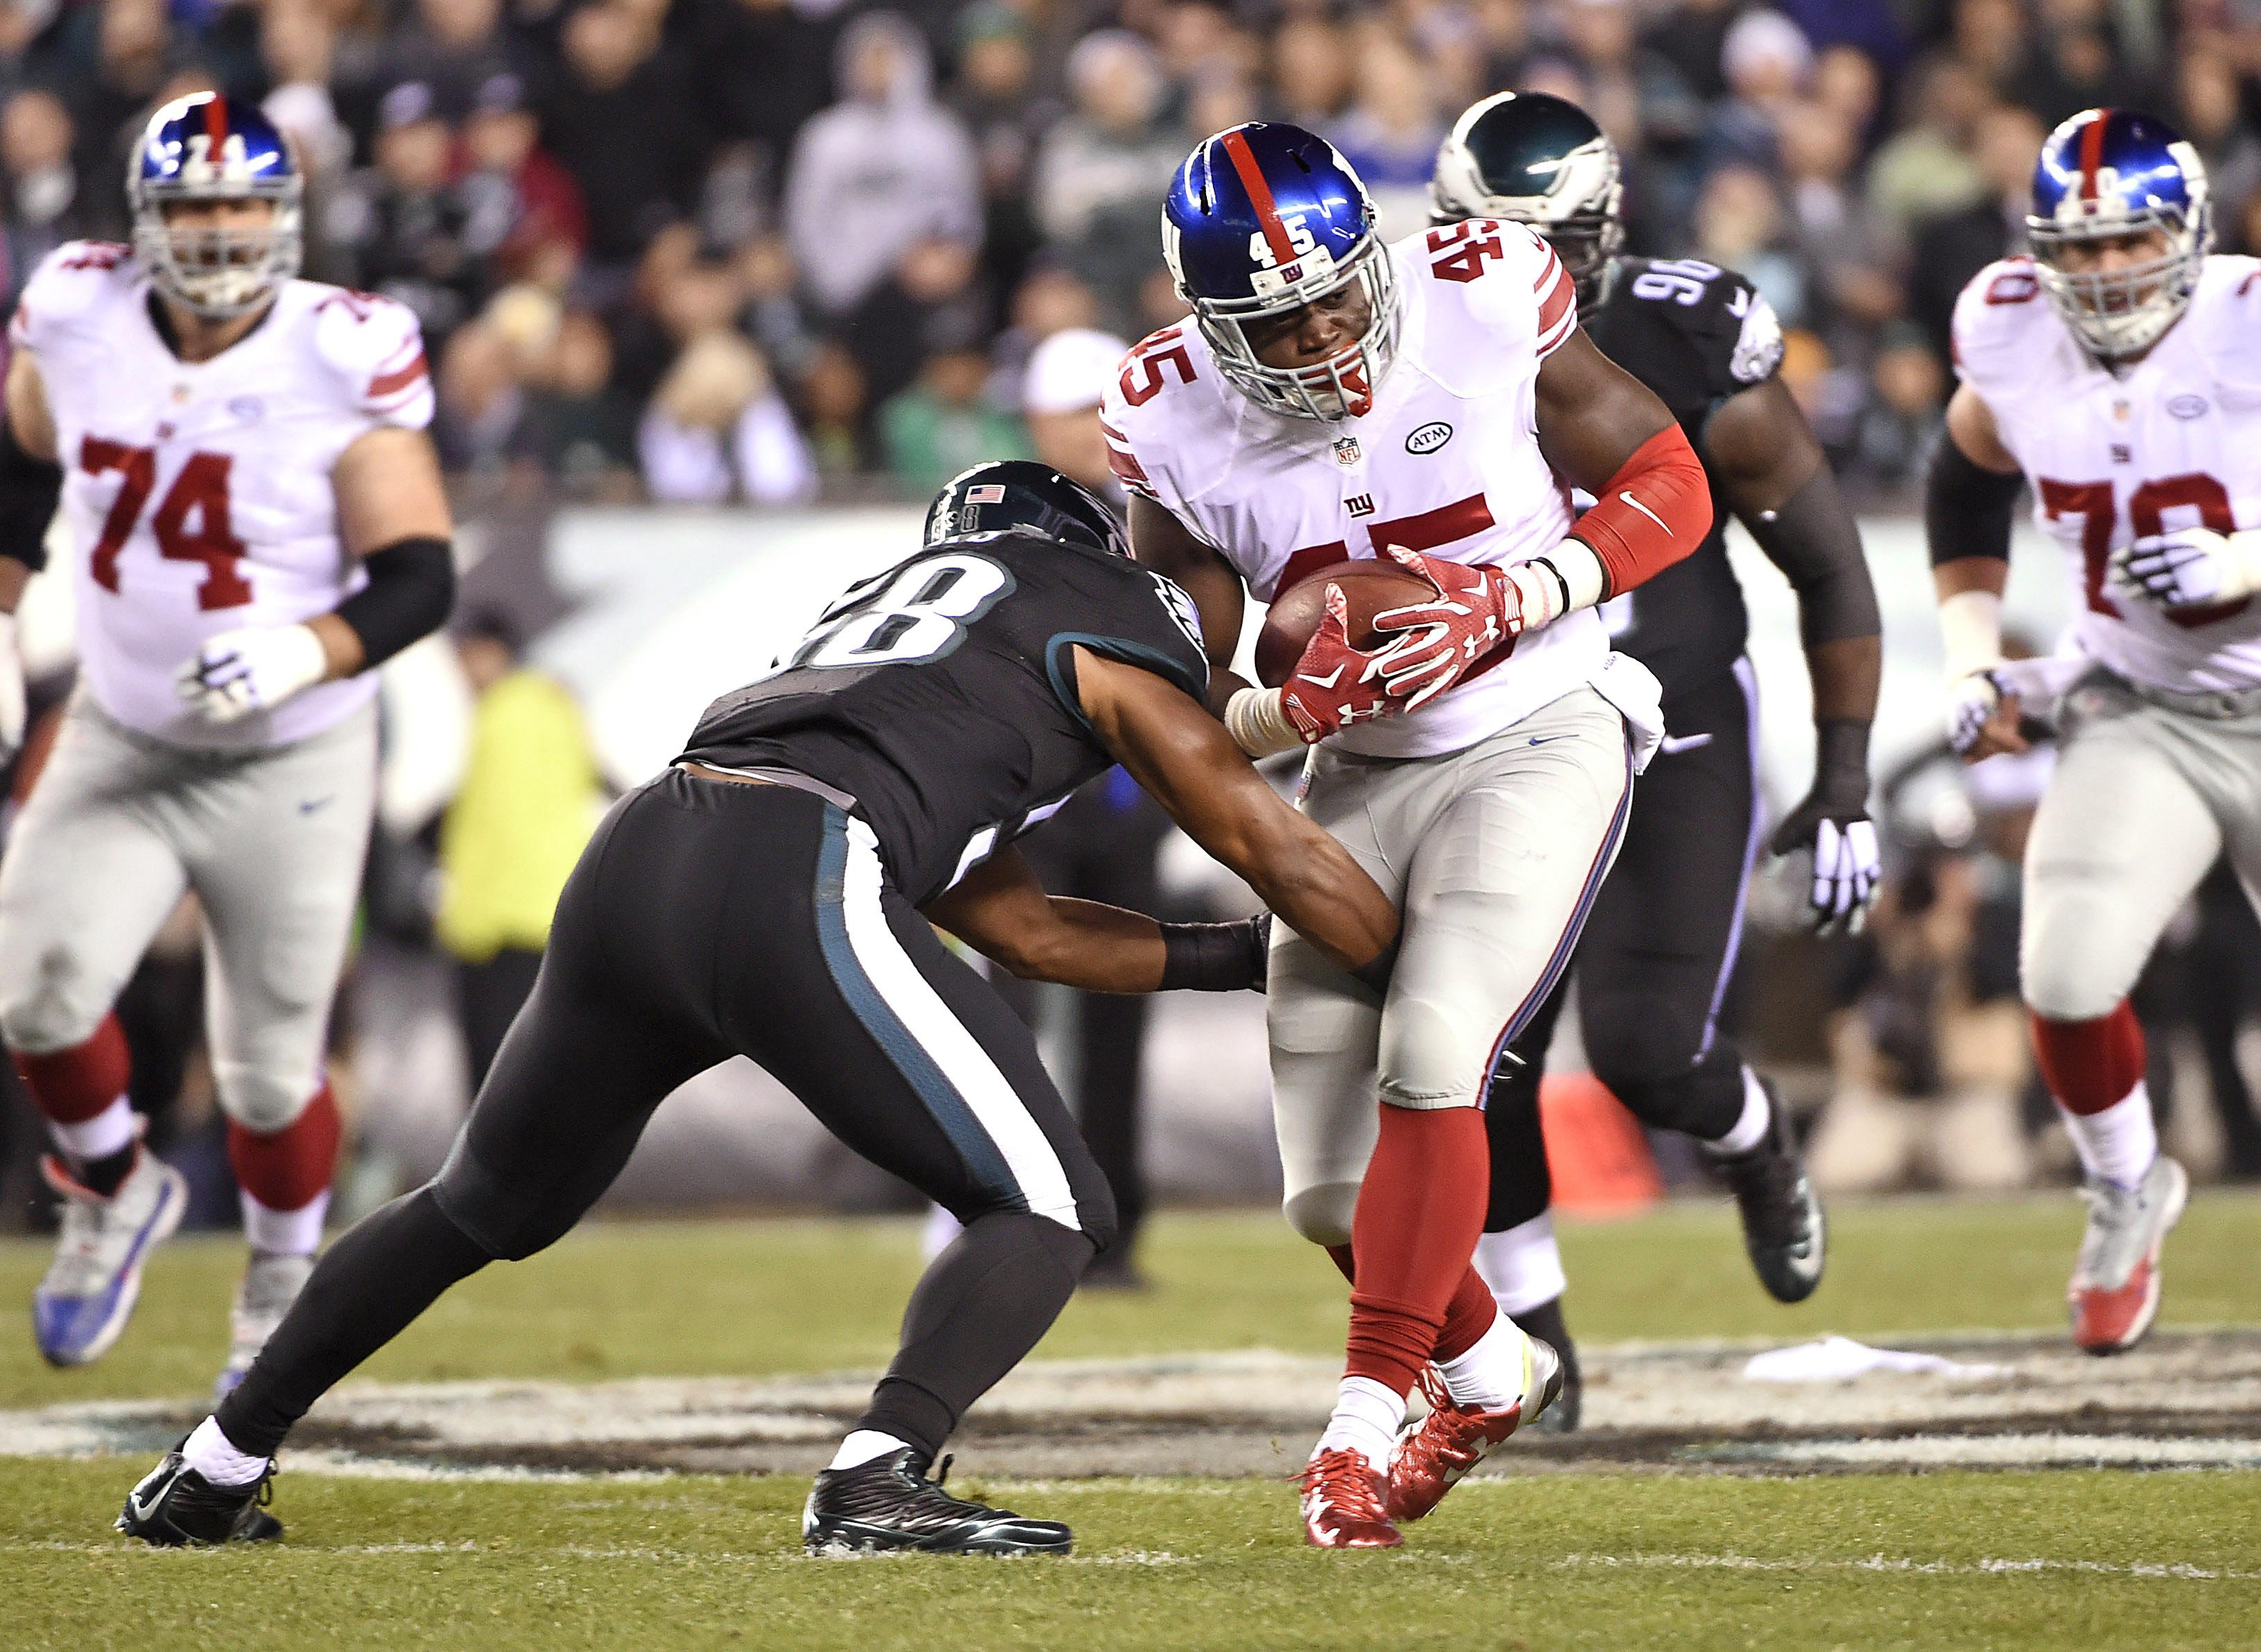 Giants tight end Will Tye